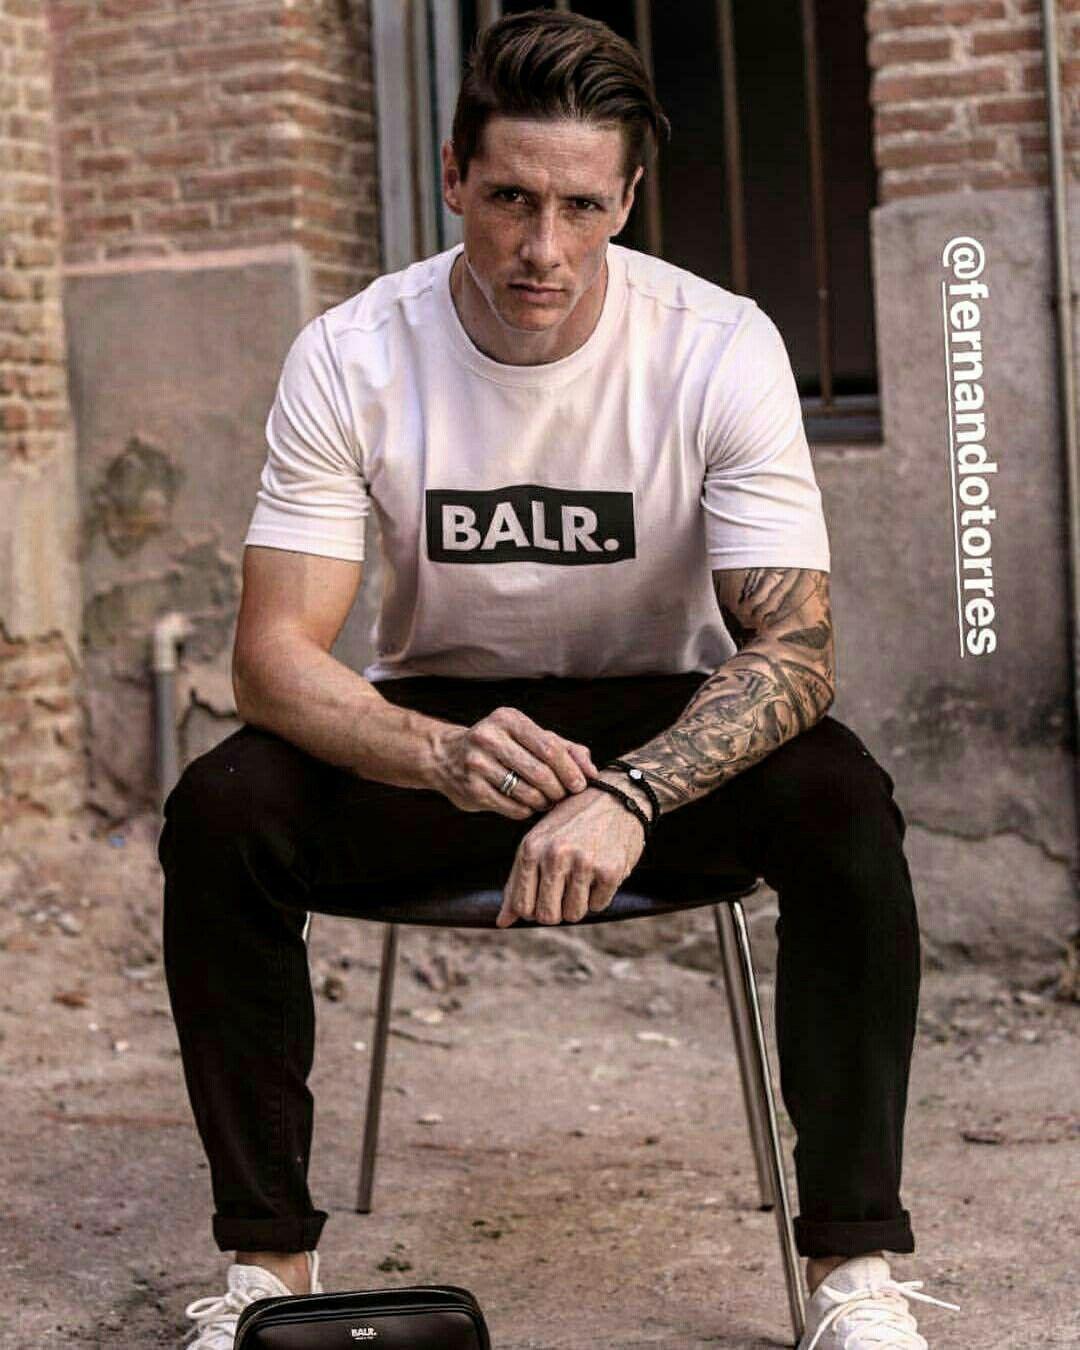 Sergio Balr Torres Fernando Torres Farnando nCxBa7qf